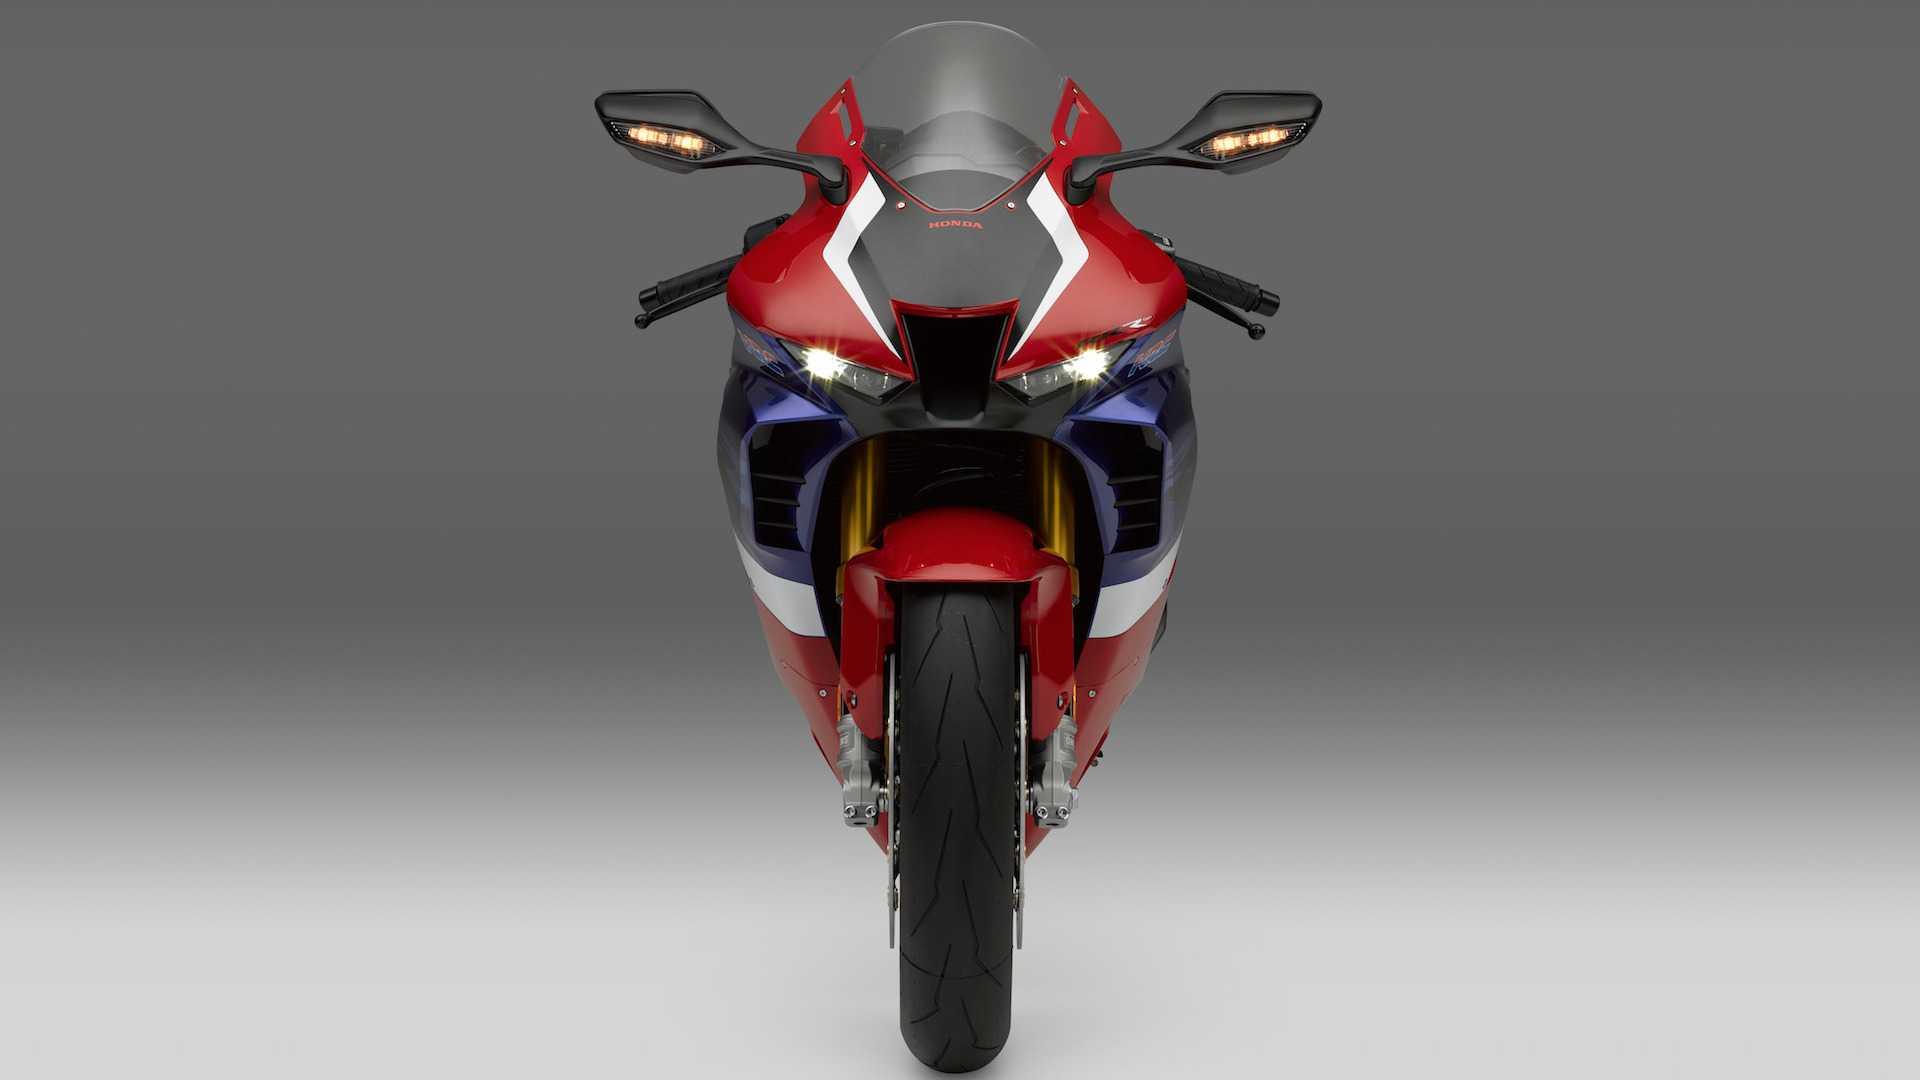 Honda(ホンダ) 2020年新型CBR1000RR-Rをついに公開! すごすぎるマシンが来た!